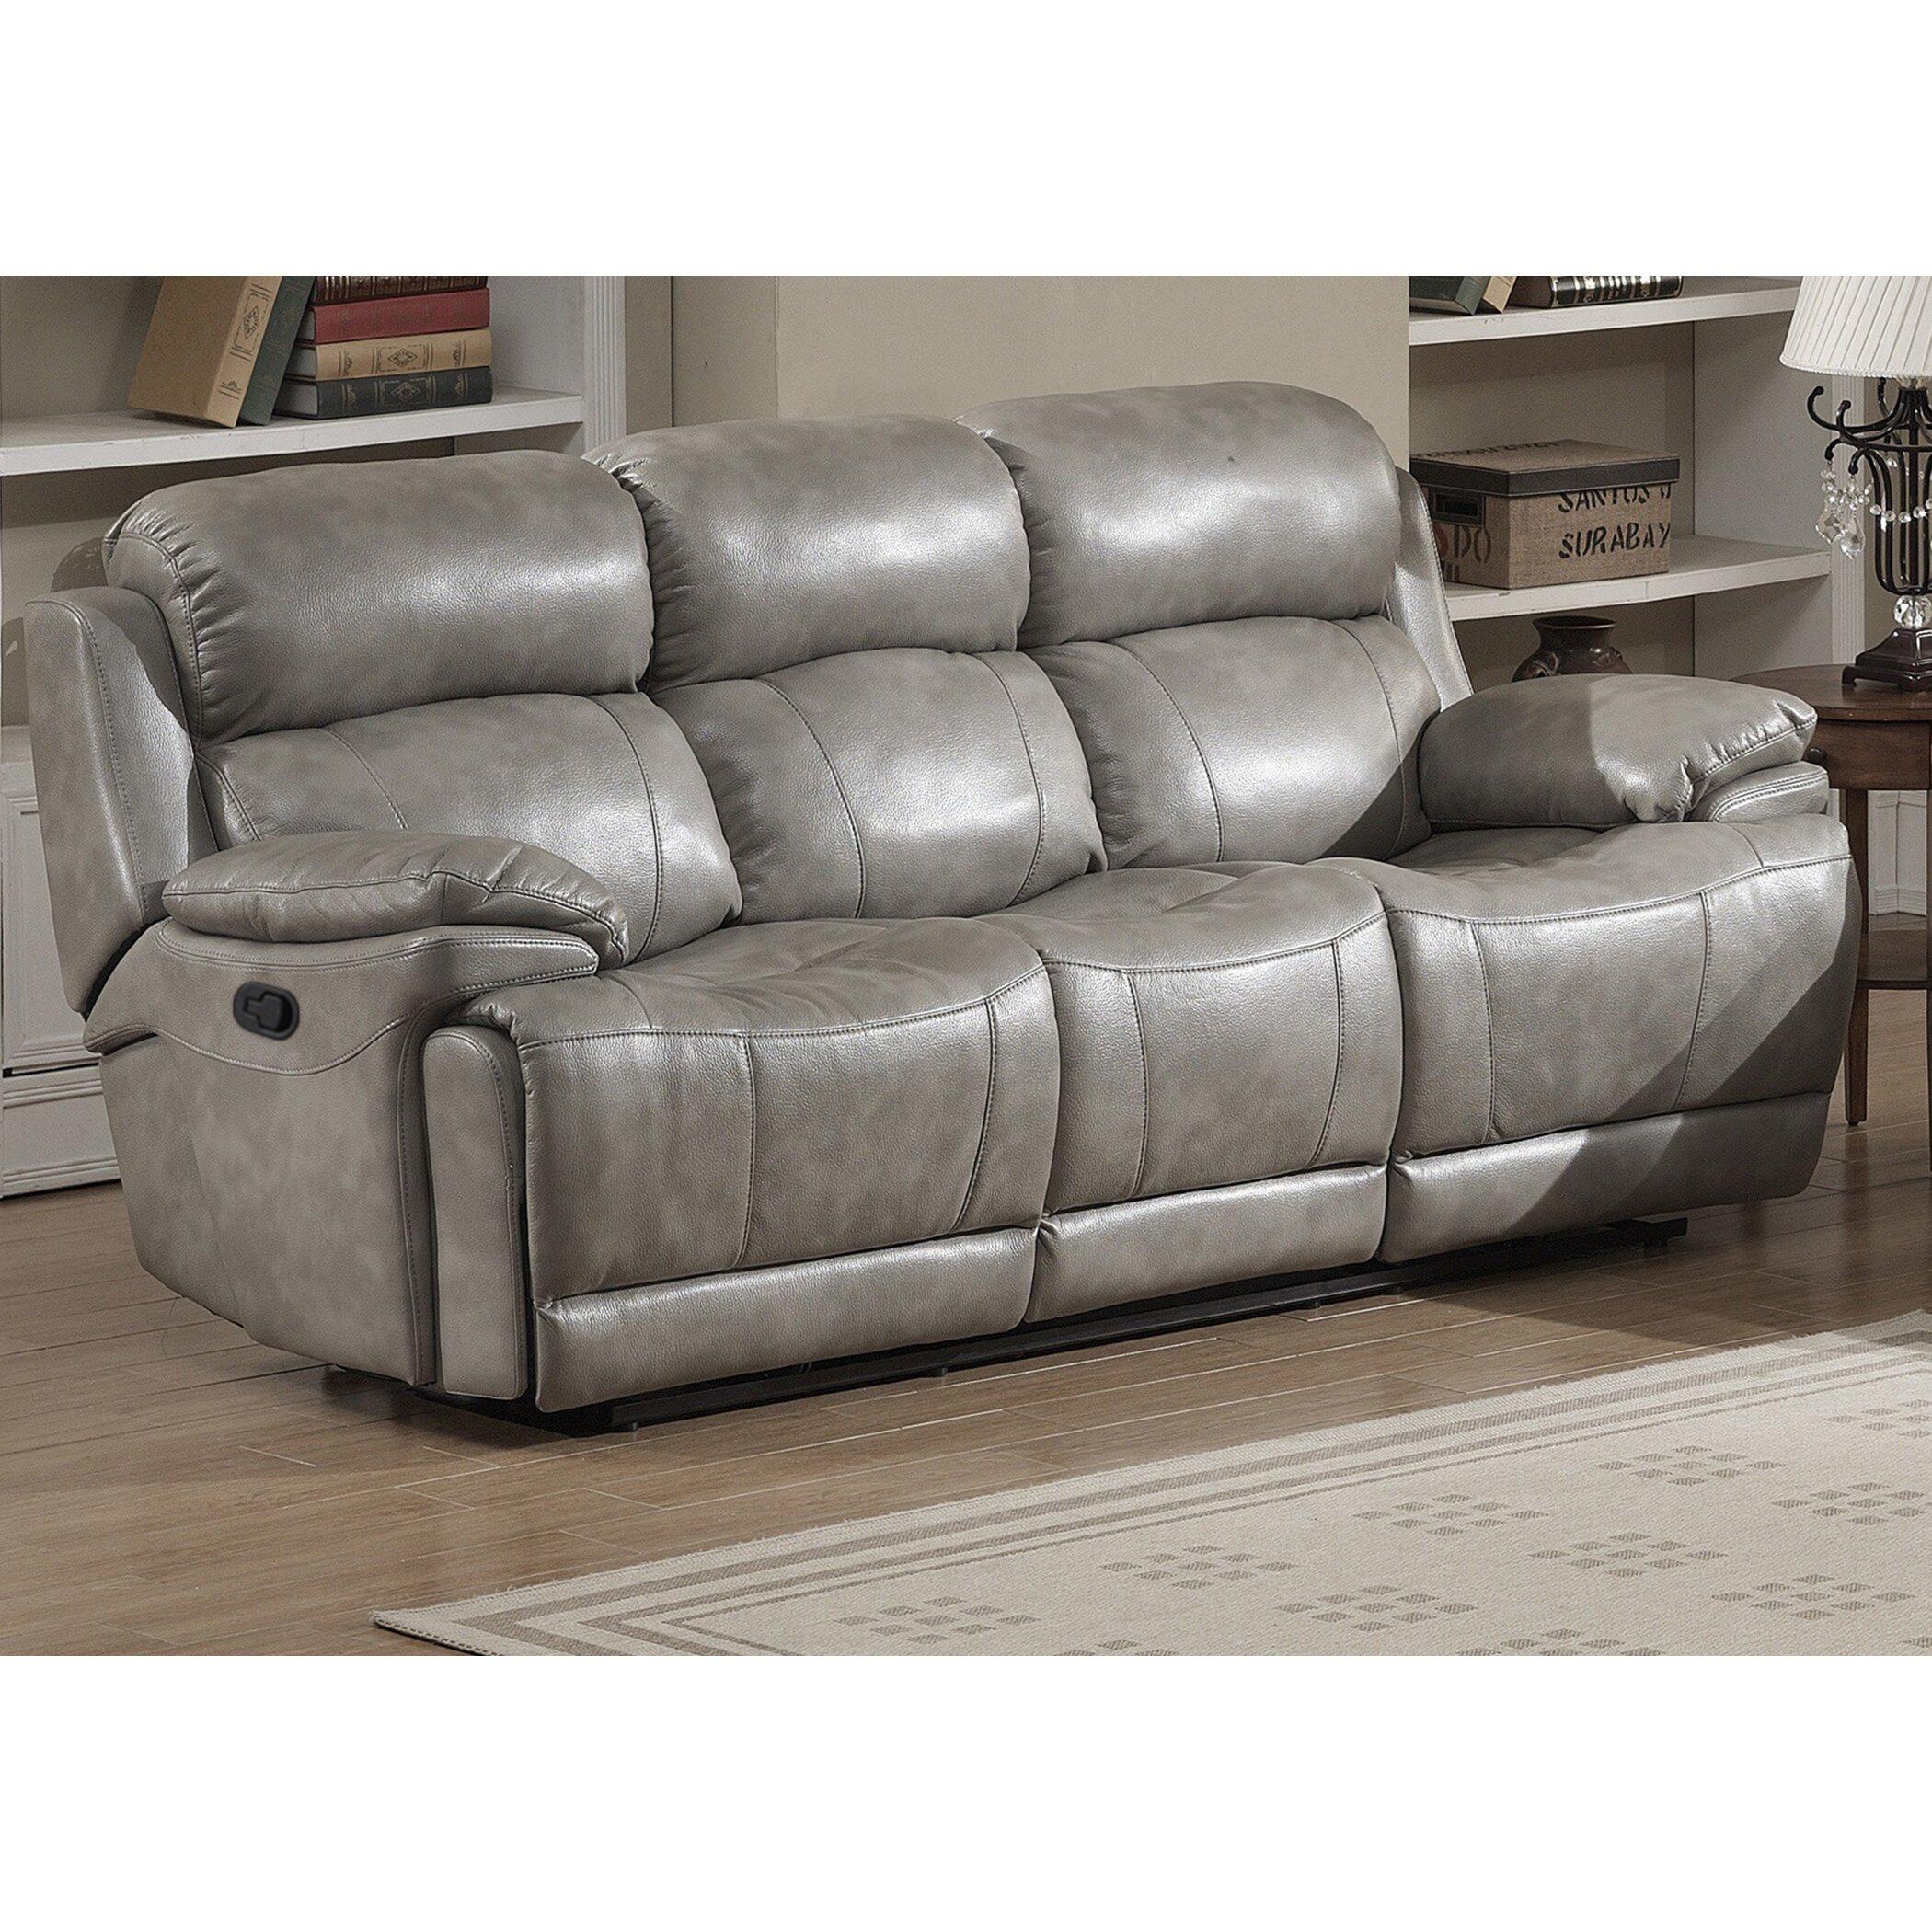 ac pacific estella sofa and loveseat set reviews wayfair